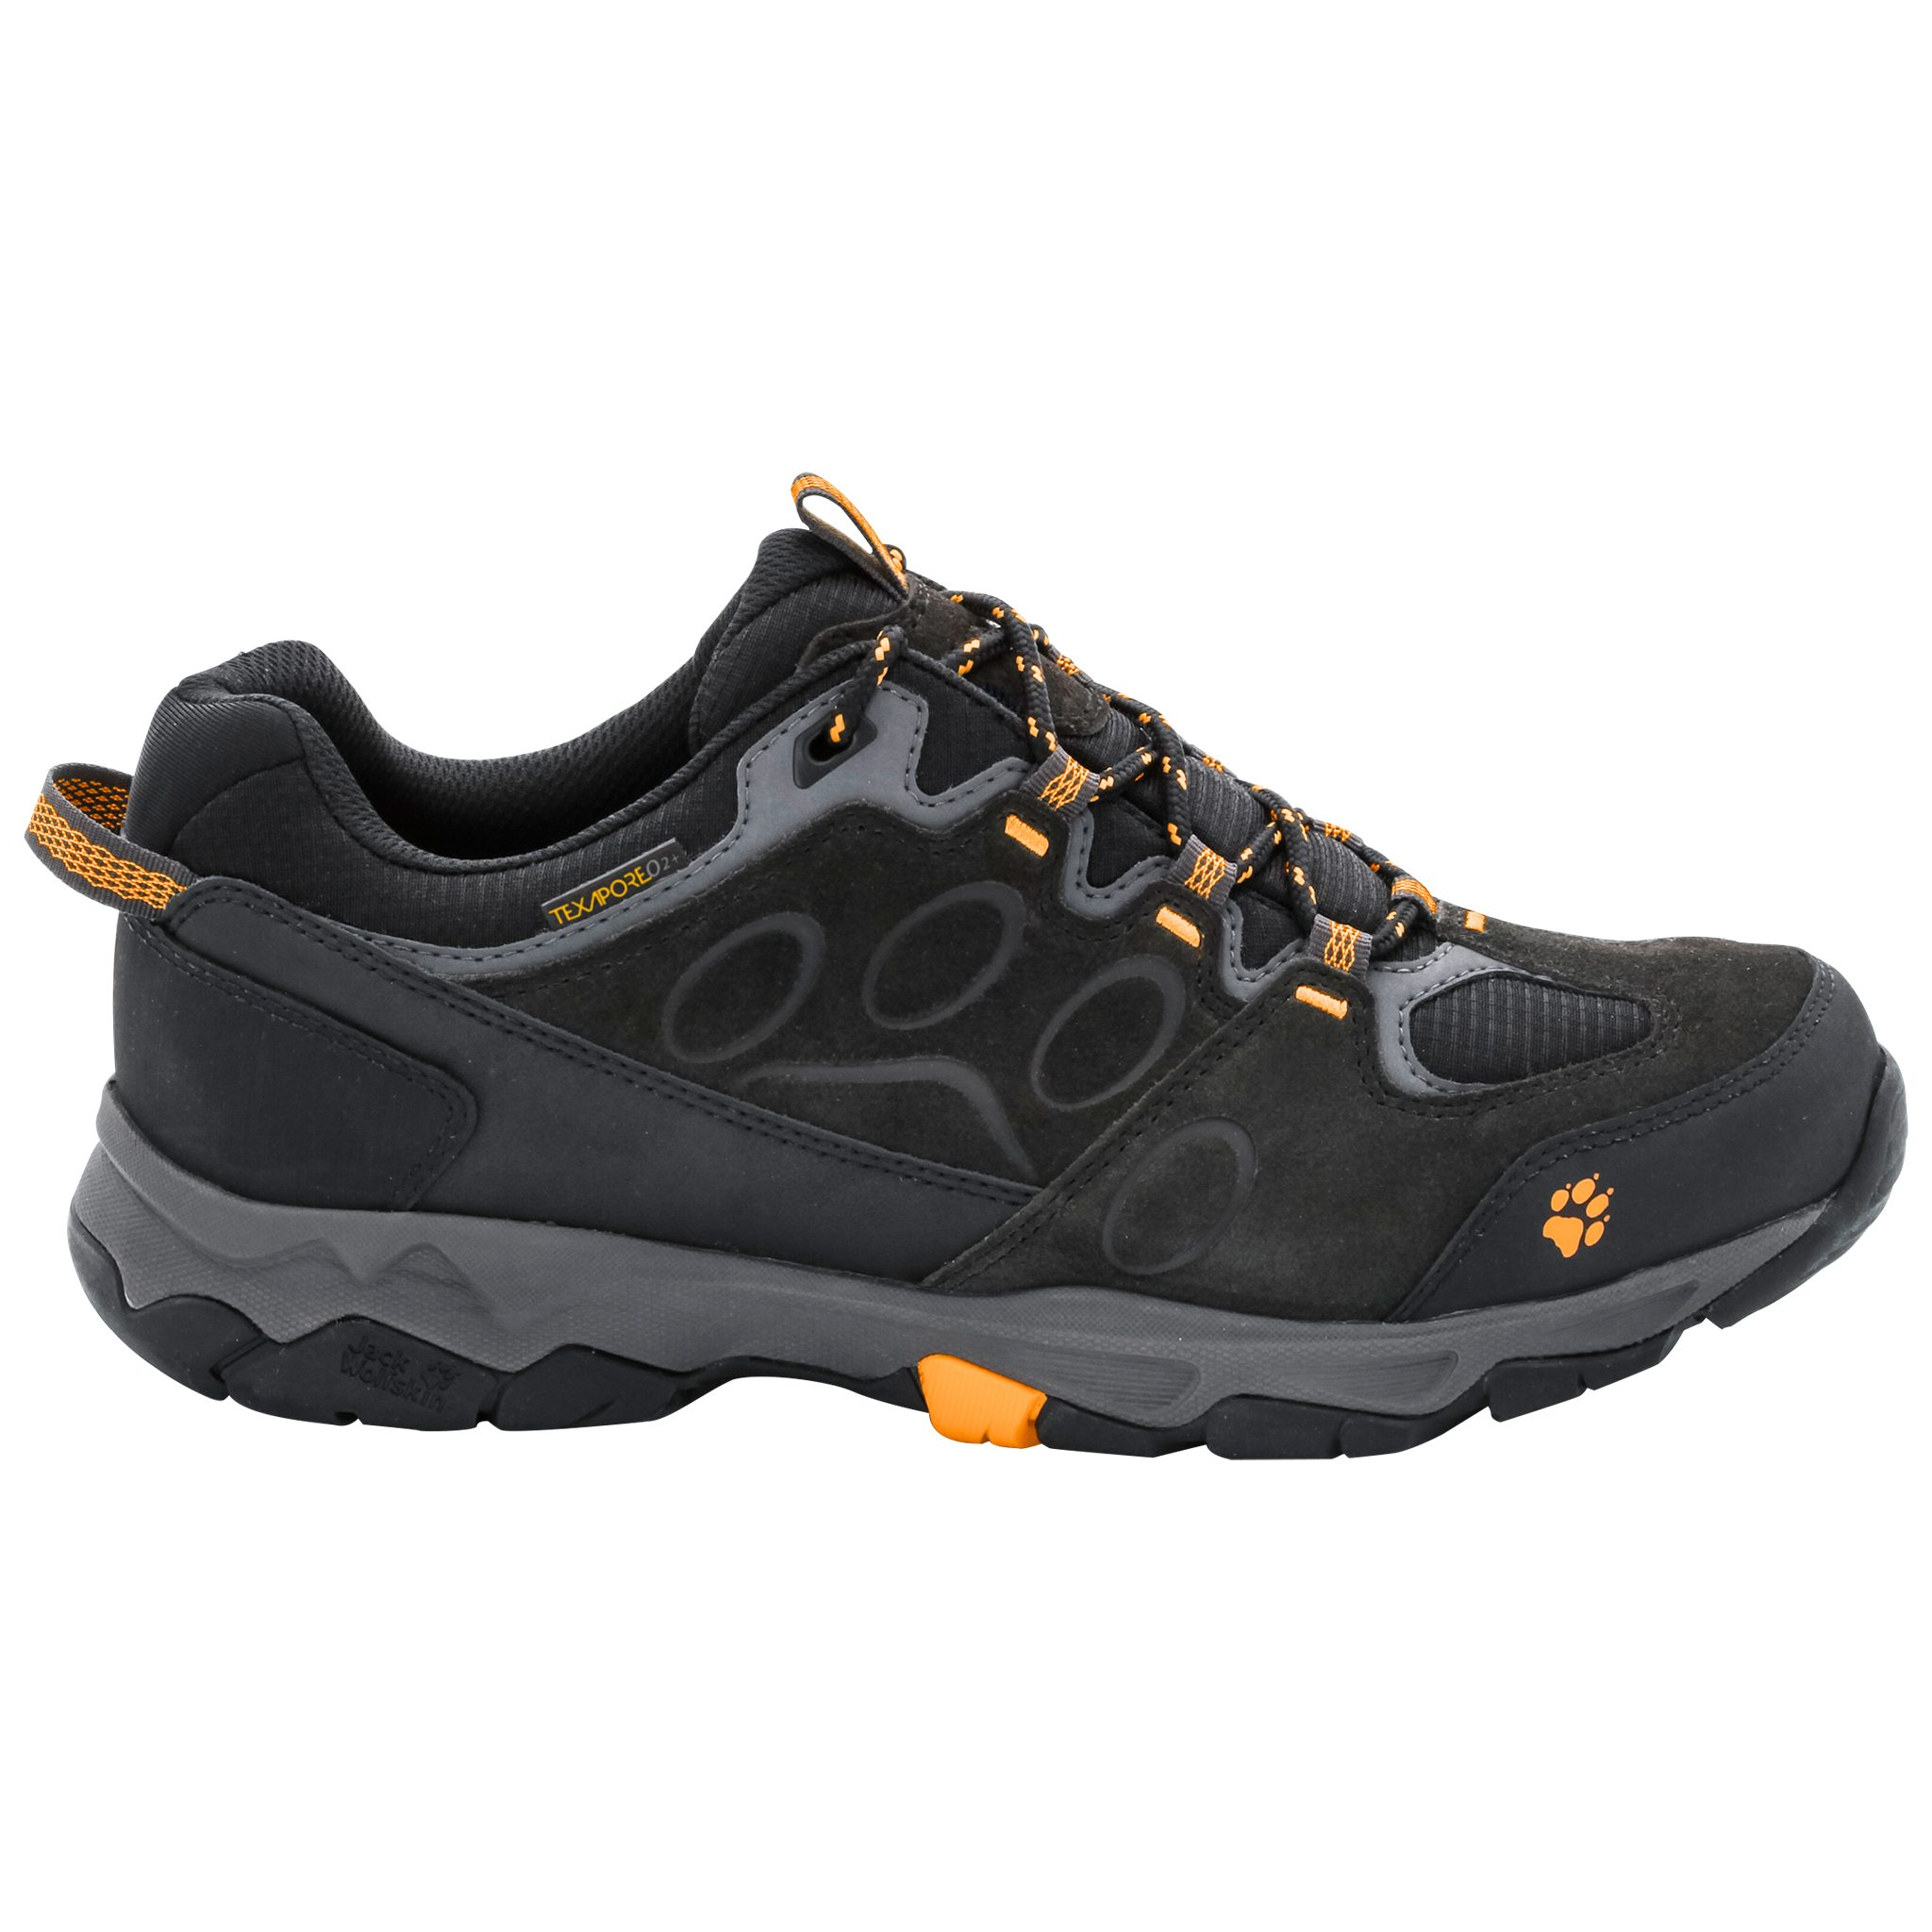 Black Jack Wolfskin Chaussures Texapore Pour Les Hommes t4PWN14